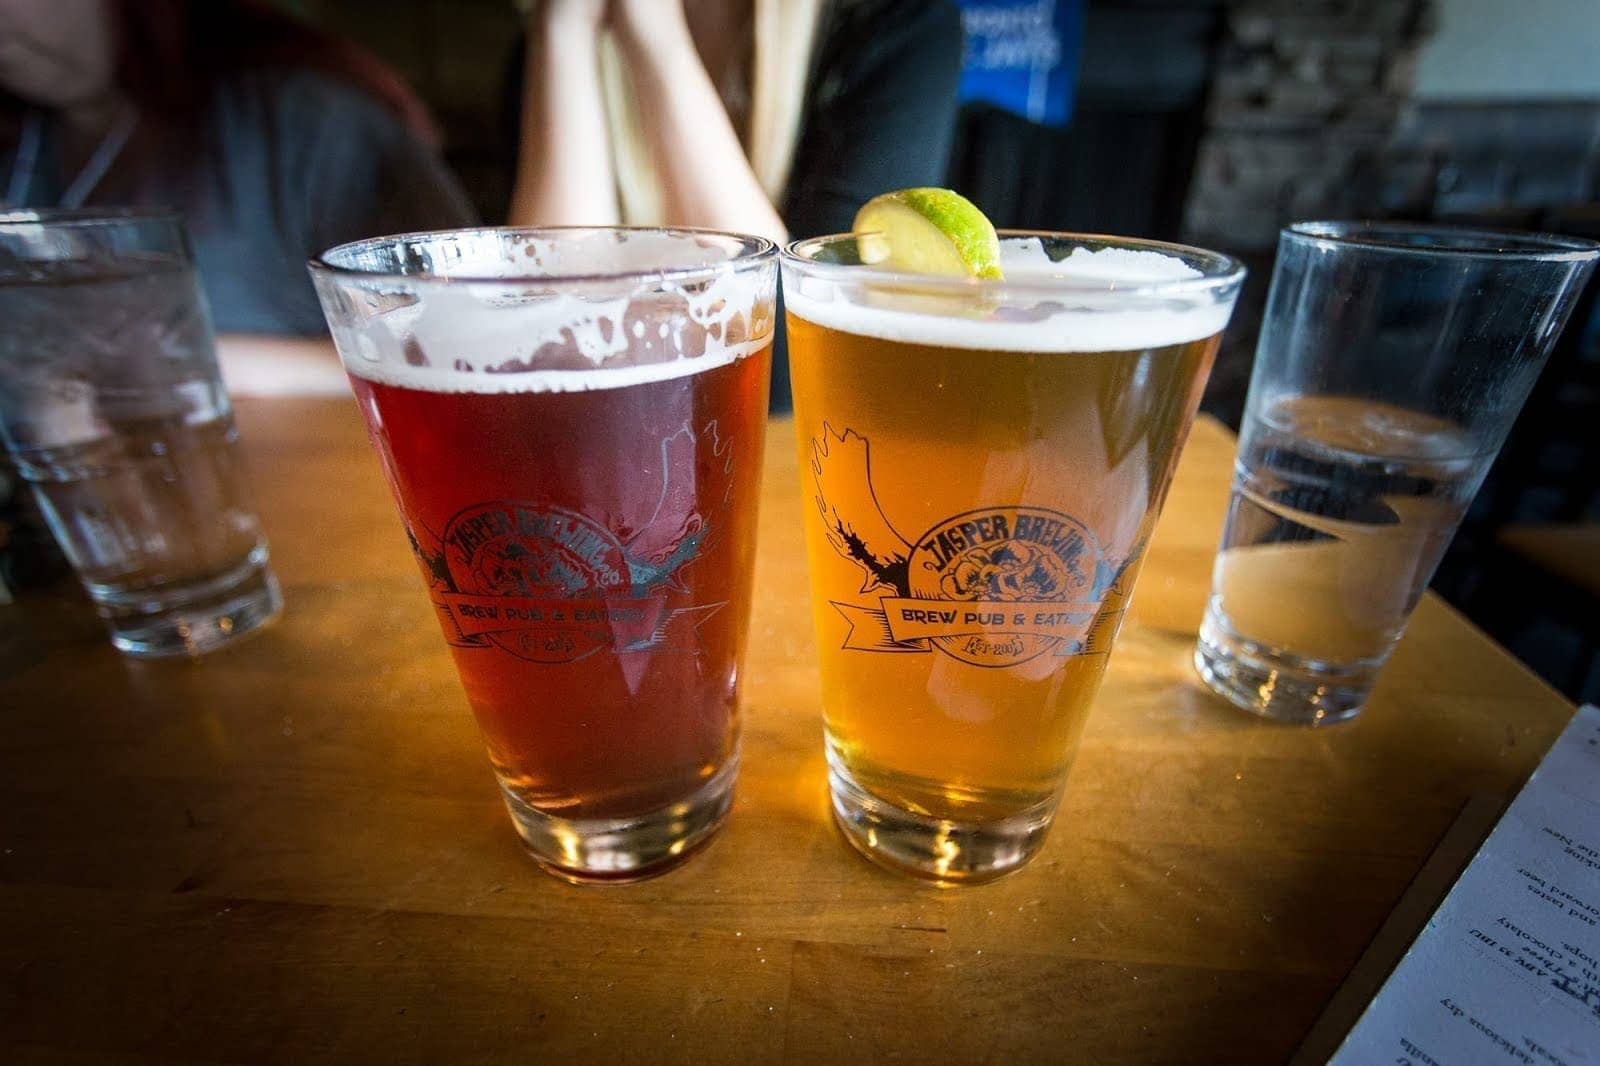 Jasper brewery by Laurence Norah